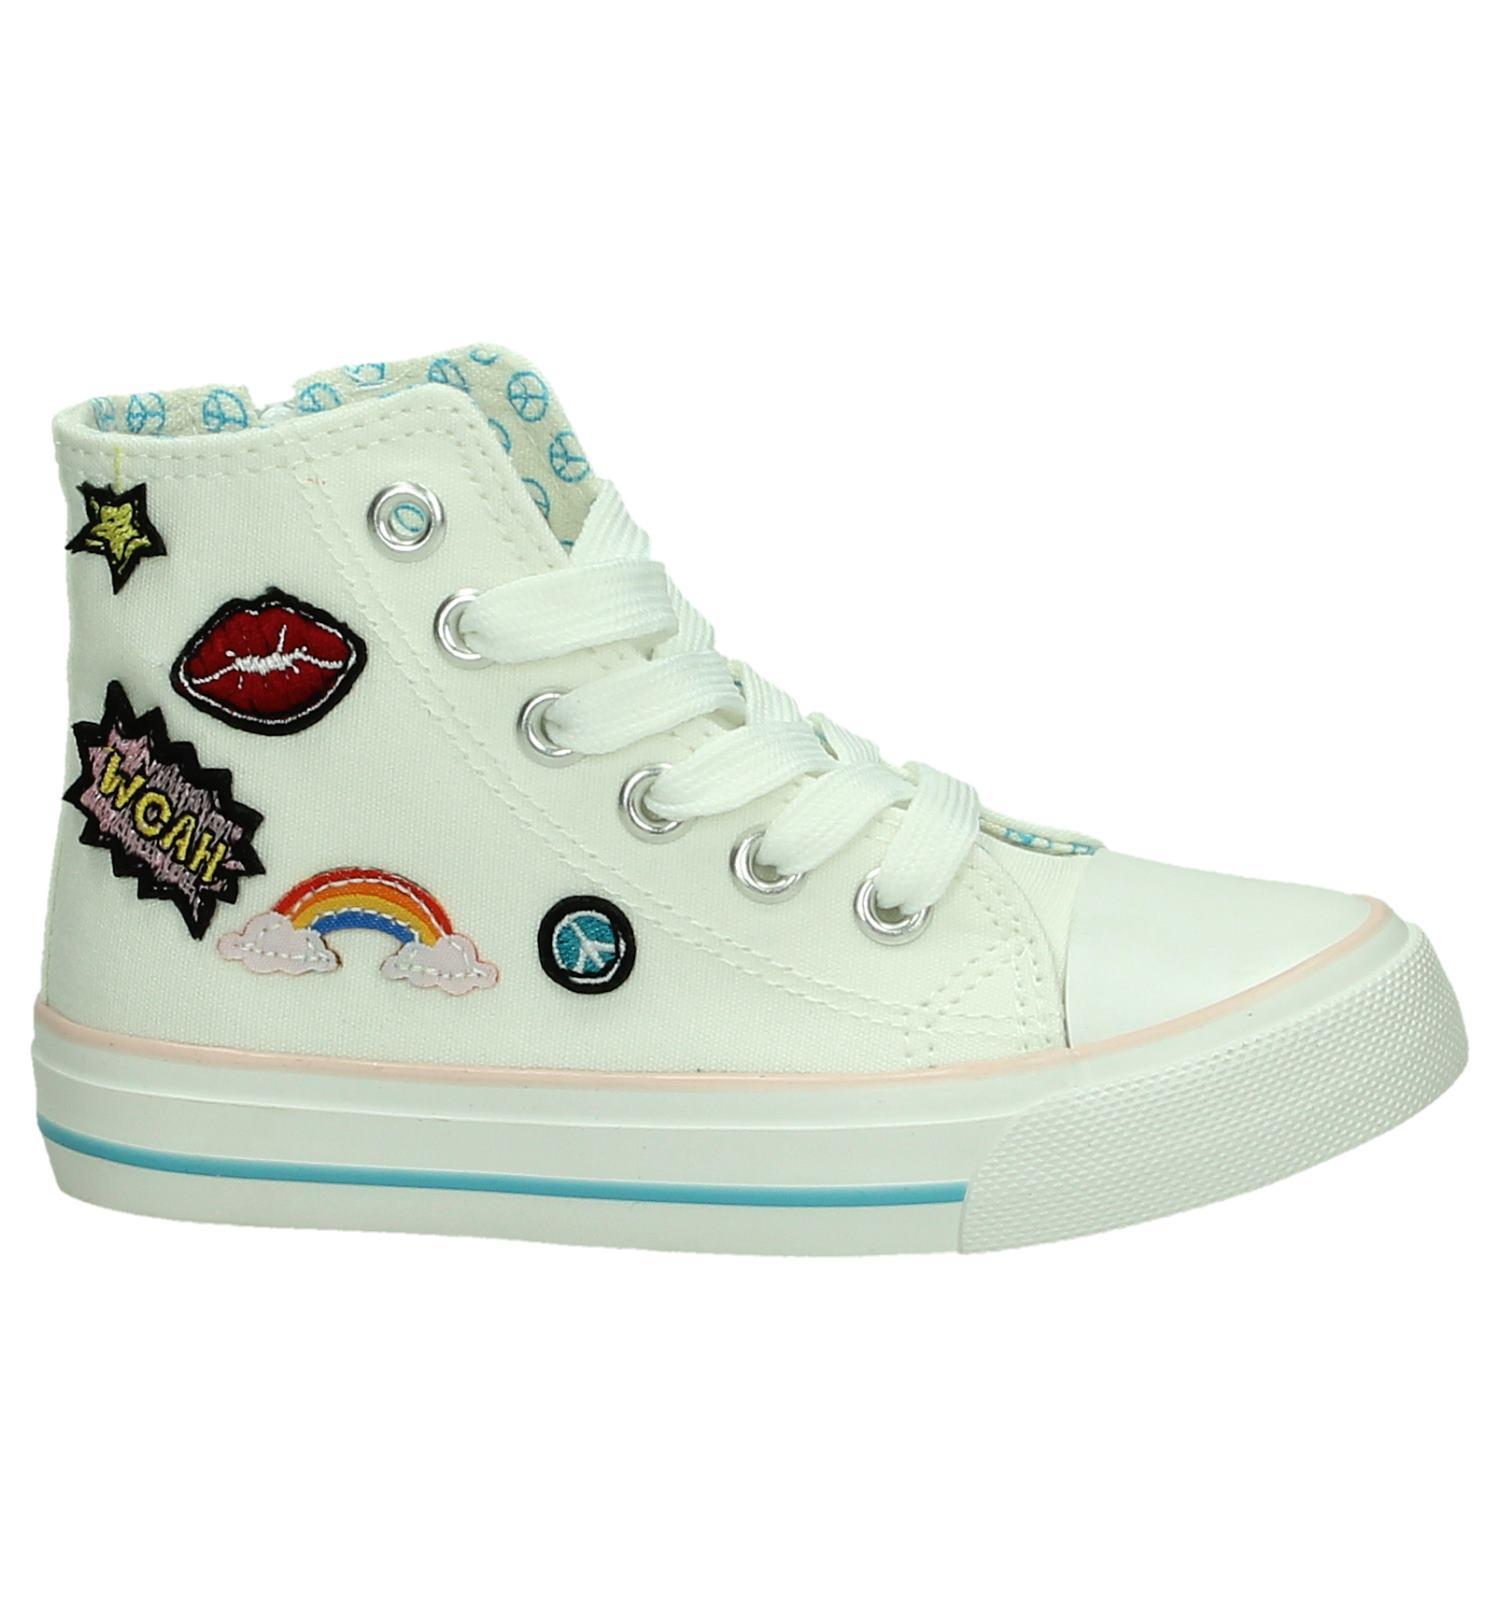 68a54e5170b K3 Witte Sneakers   TORFS.BE   Gratis verzend en retour